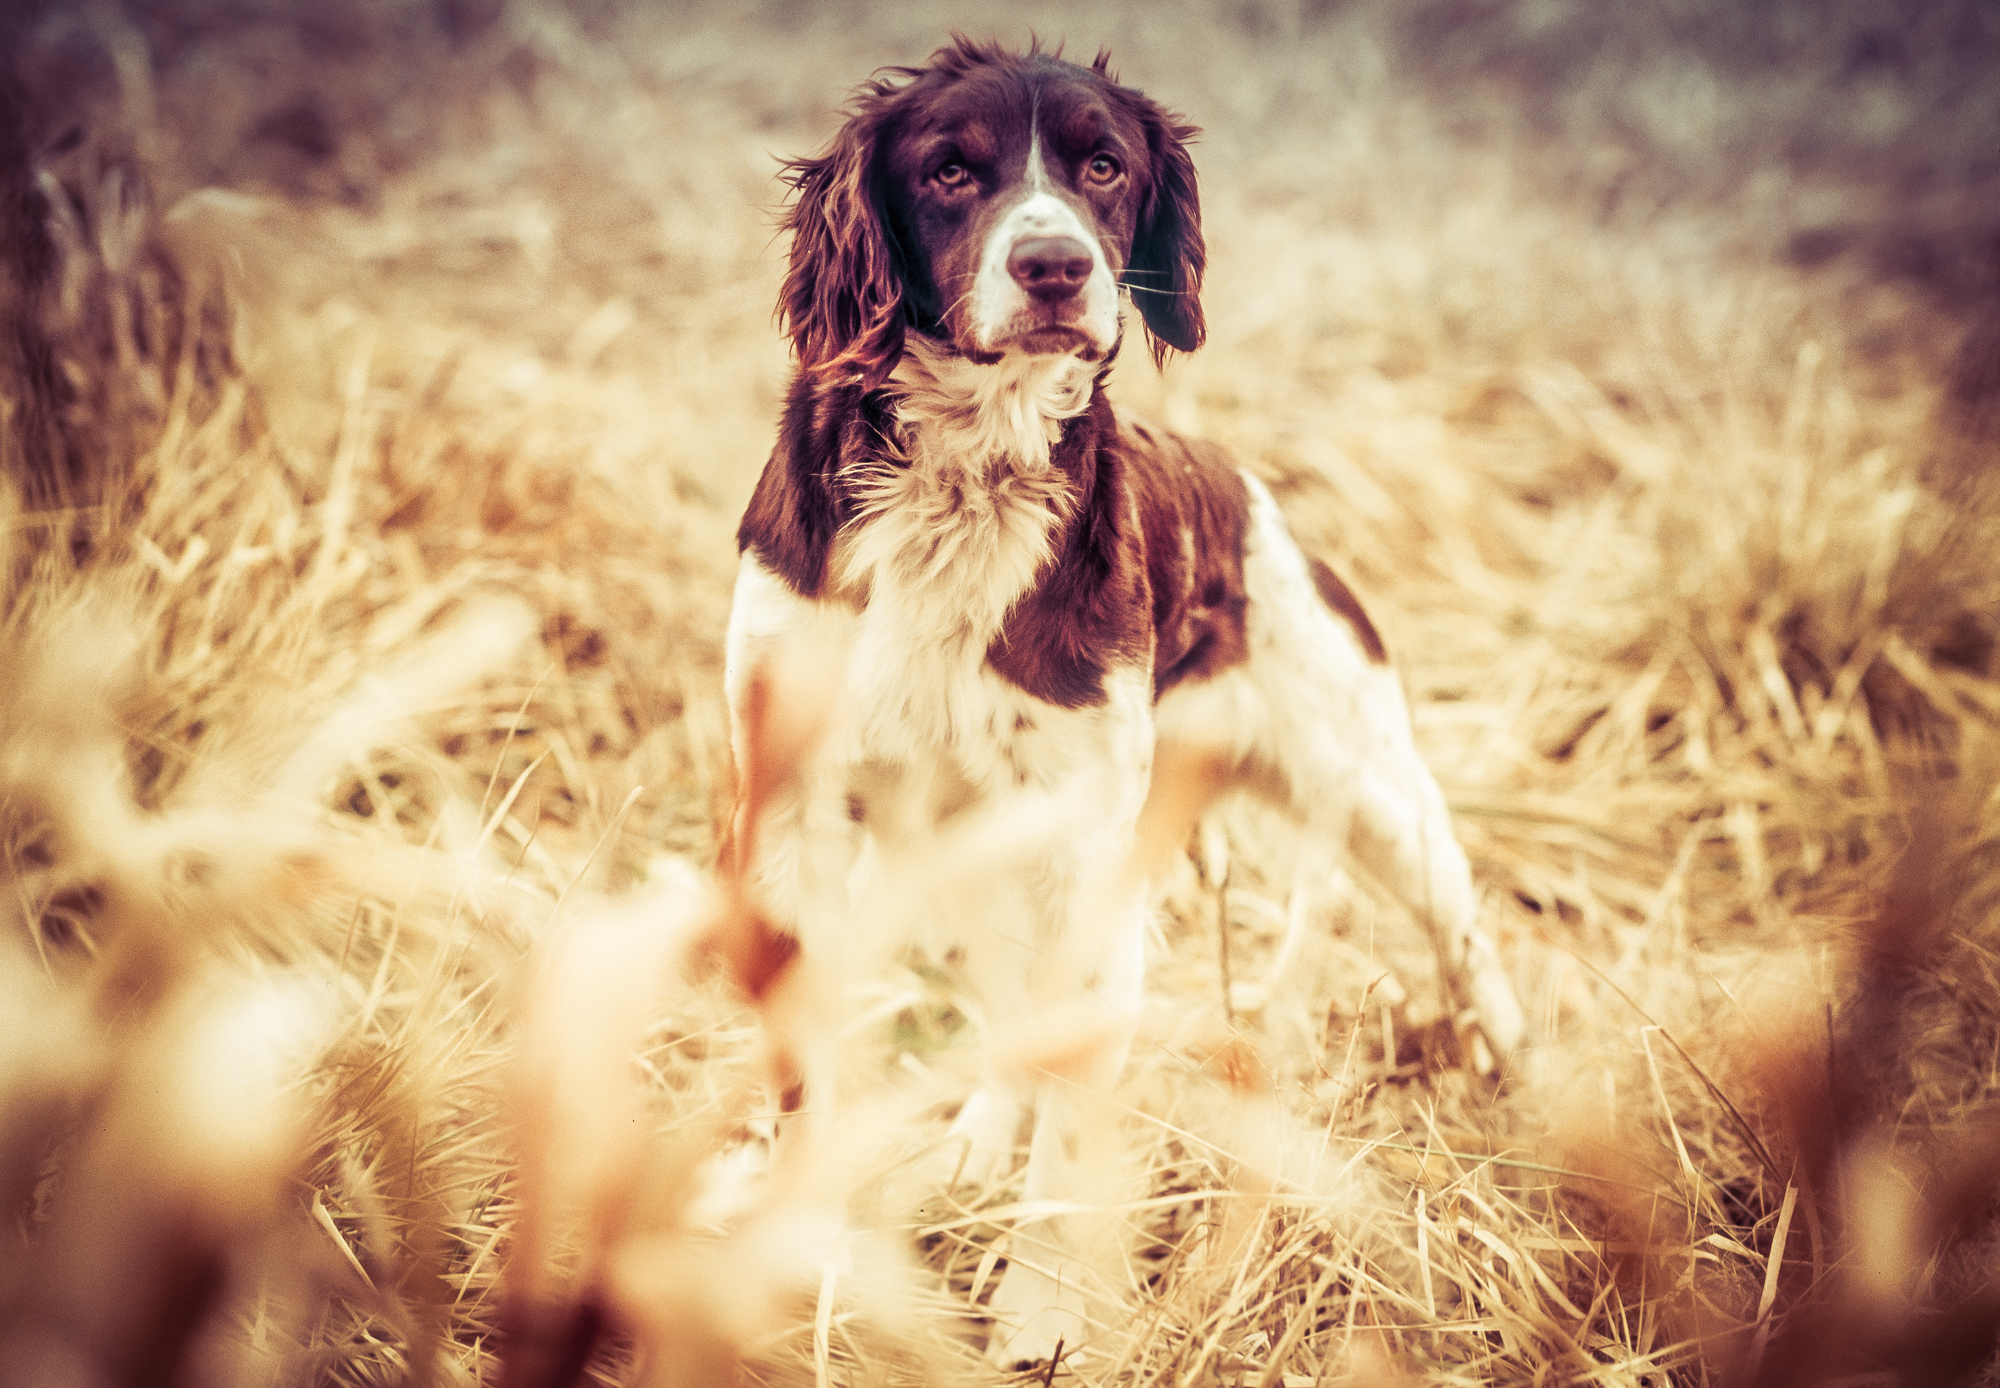 rick-meoli-commercial-photographer-outdoor-animal-lifestyle-repheads-80